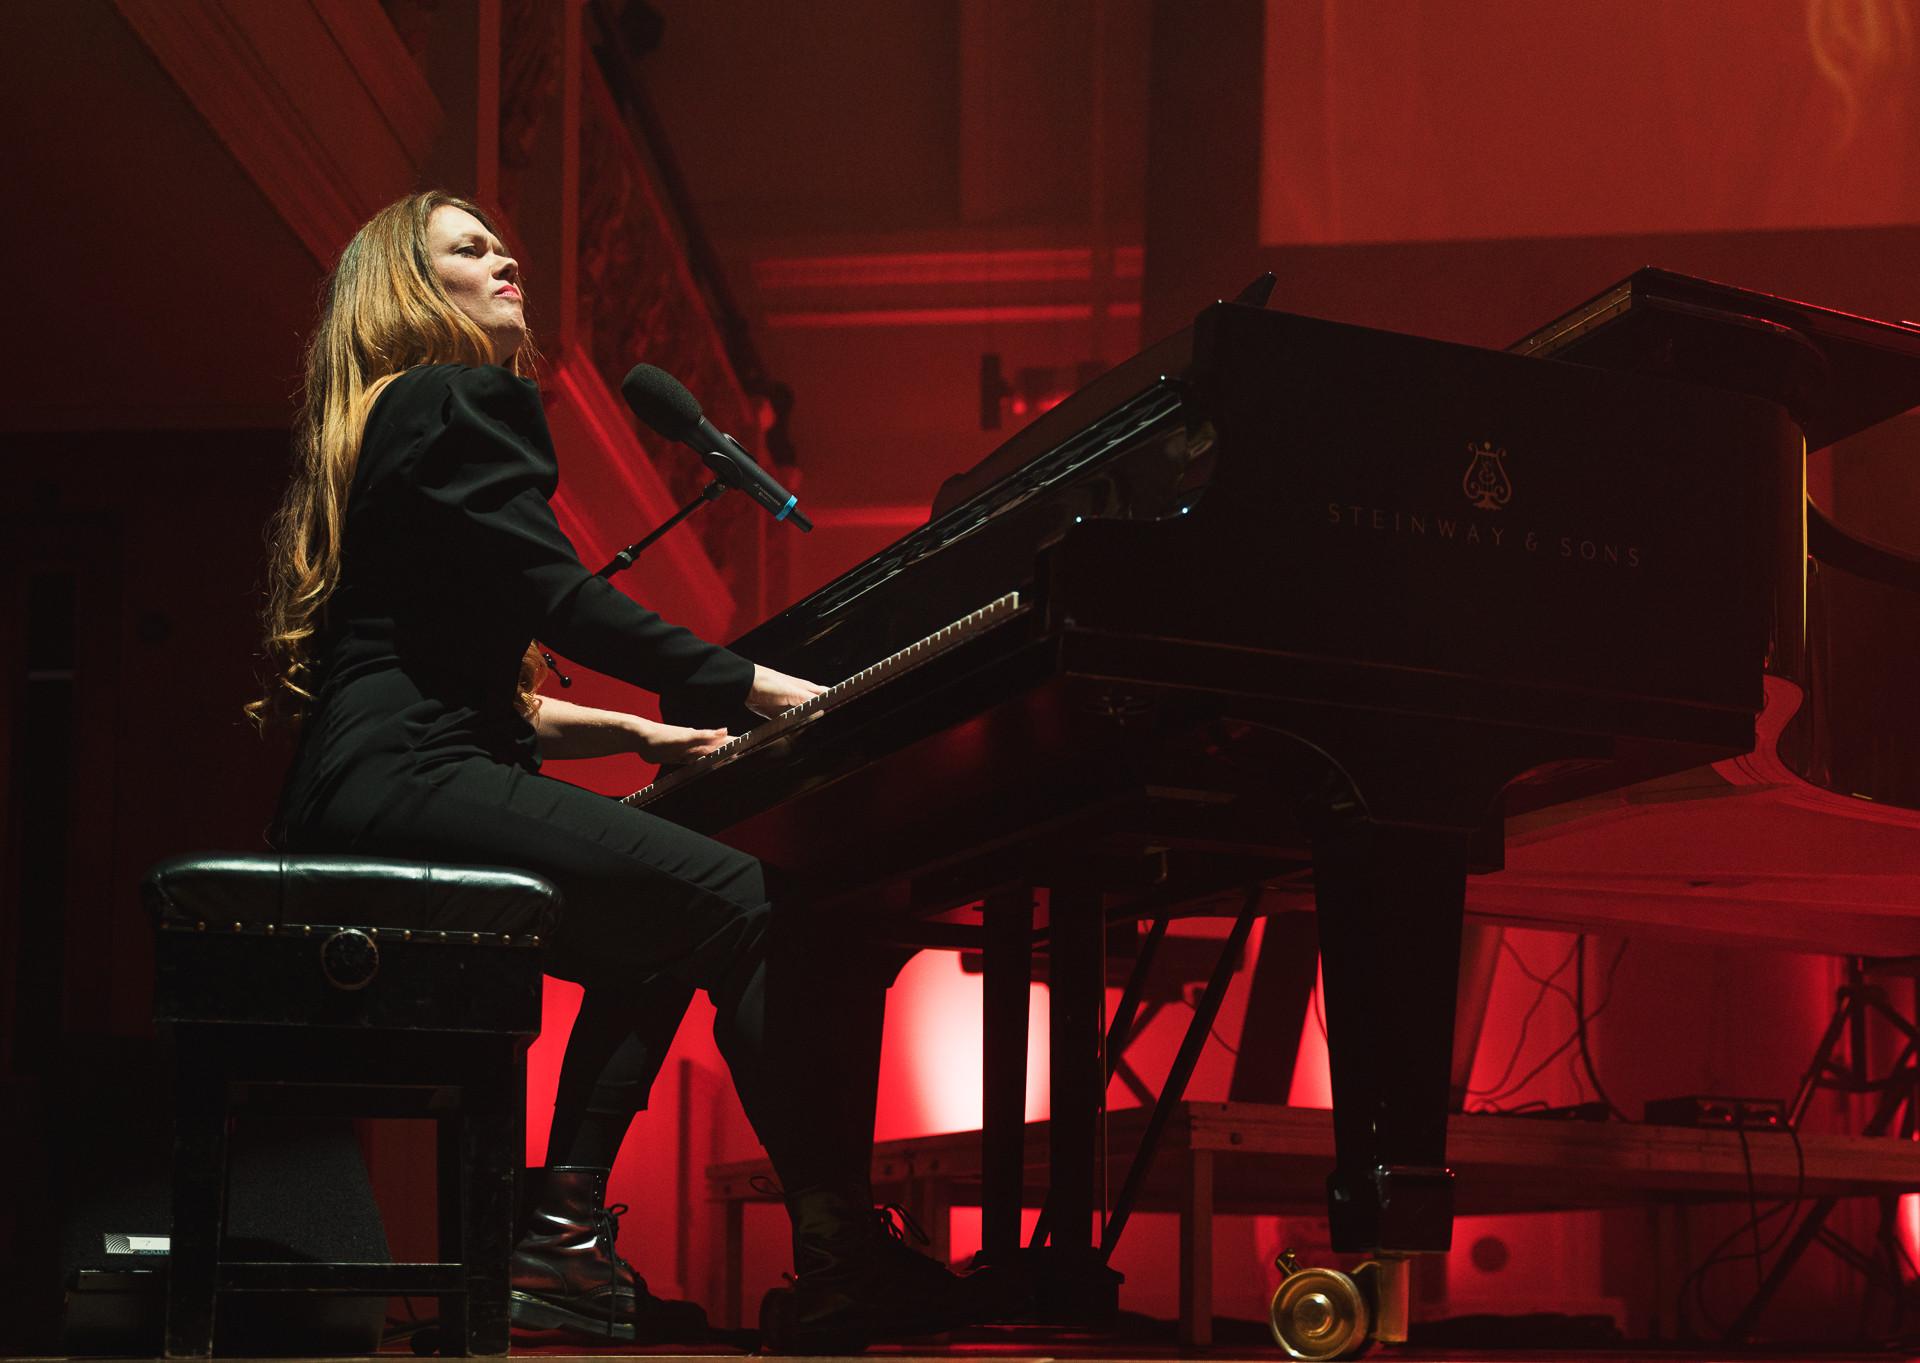 105_Drake_Yolanda_Winter_Concert_220220.